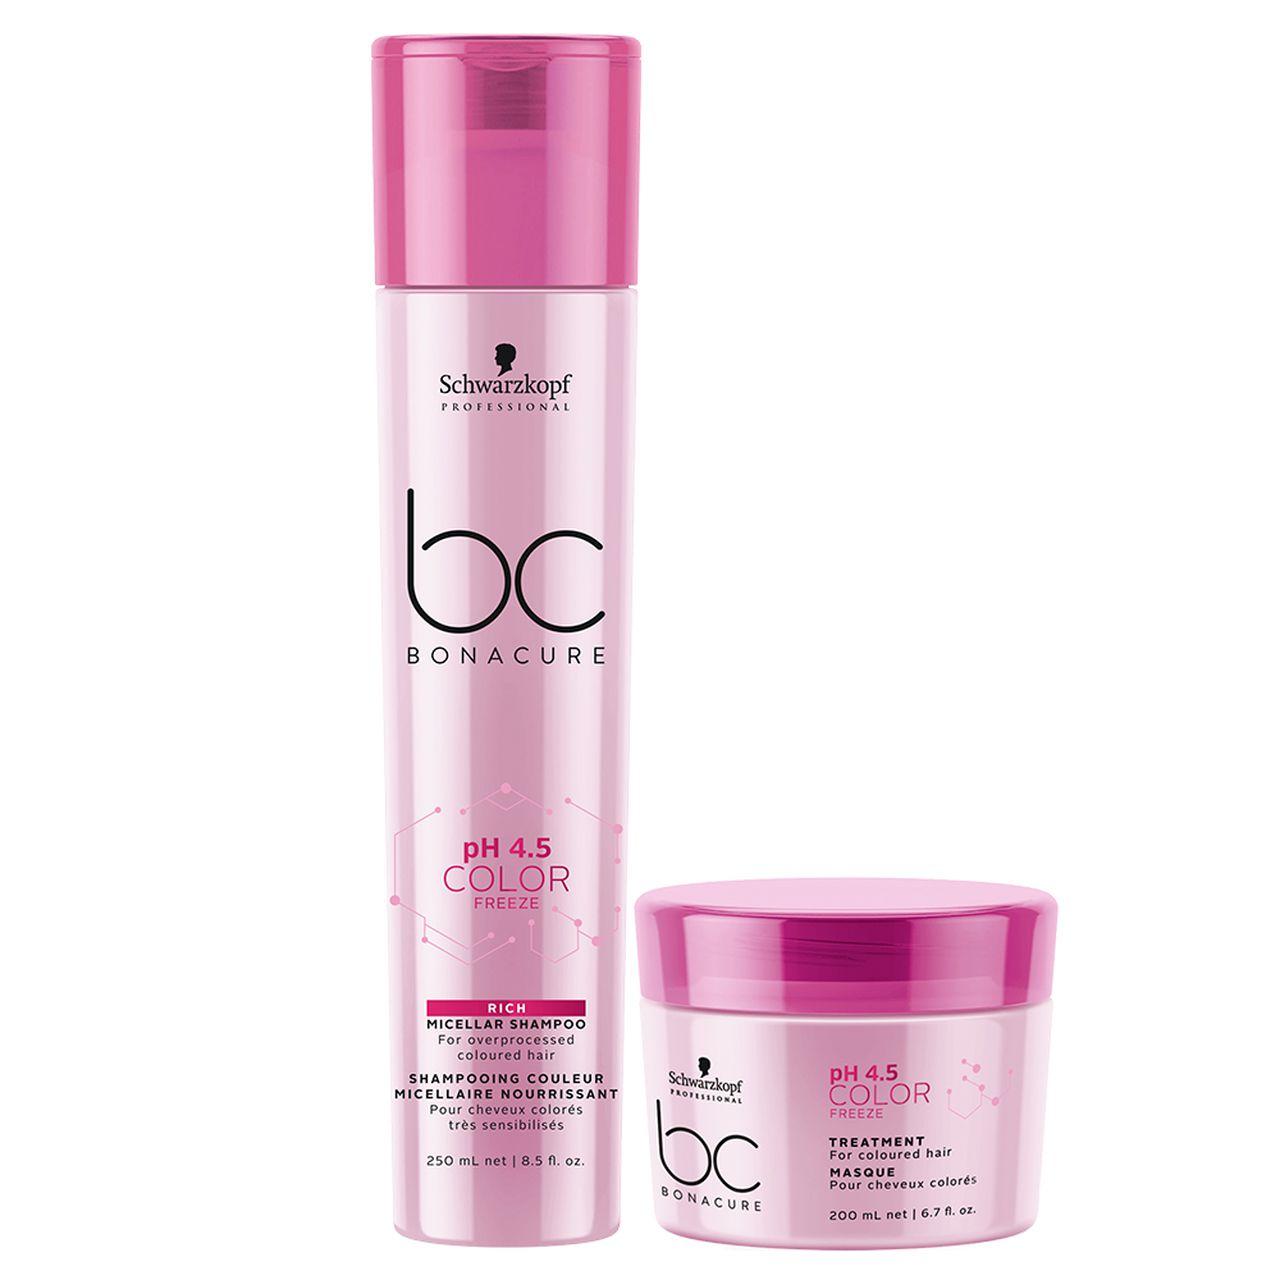 kit Color Freeze - Shampoo Rich 250 ml + Máscara 200 ml